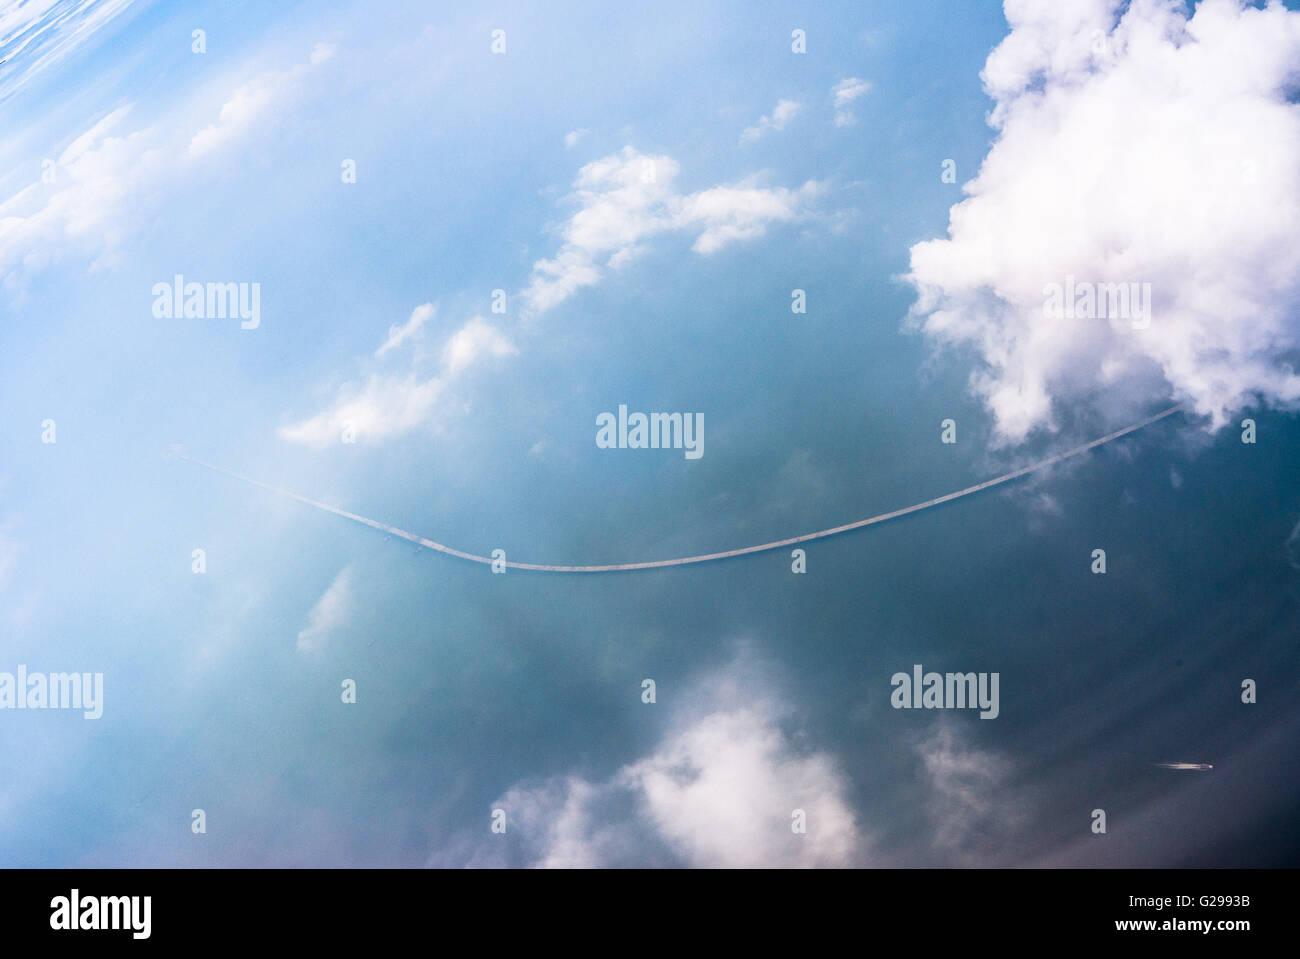 May 21, 2016 - Zhuhai, Zhuhai, CHN - Zhuhai, China - May 21 2016: (EDITORIAL USE ONLY. CHINA OUT) The Hong Kong¨CZhuhai¨CMacau - Stock Image